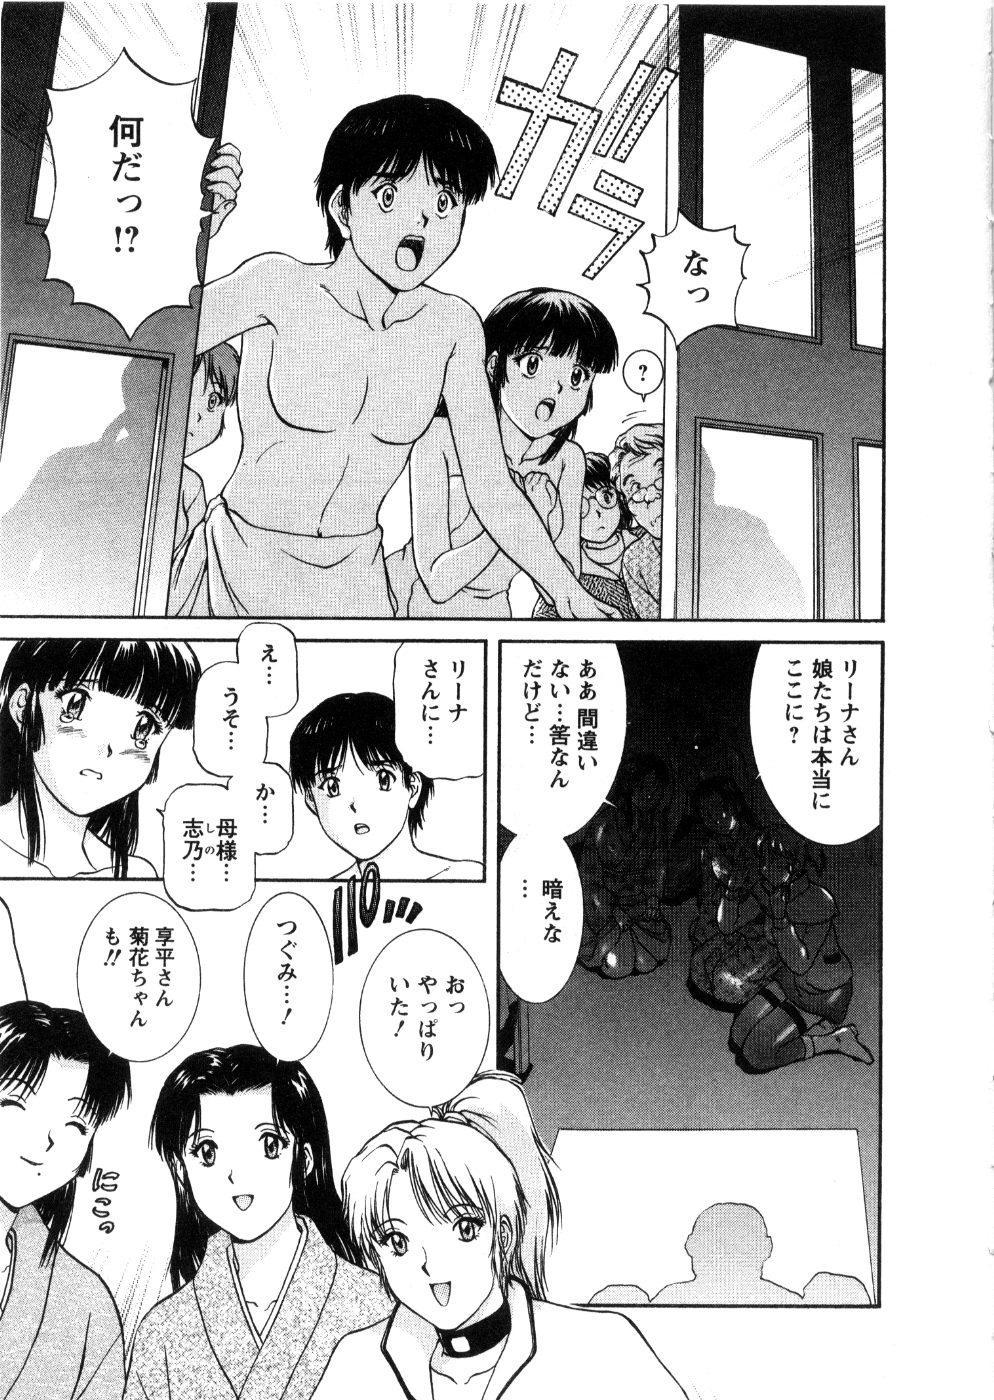 Oneechan-tachi ga Yatte Kuru 03 148